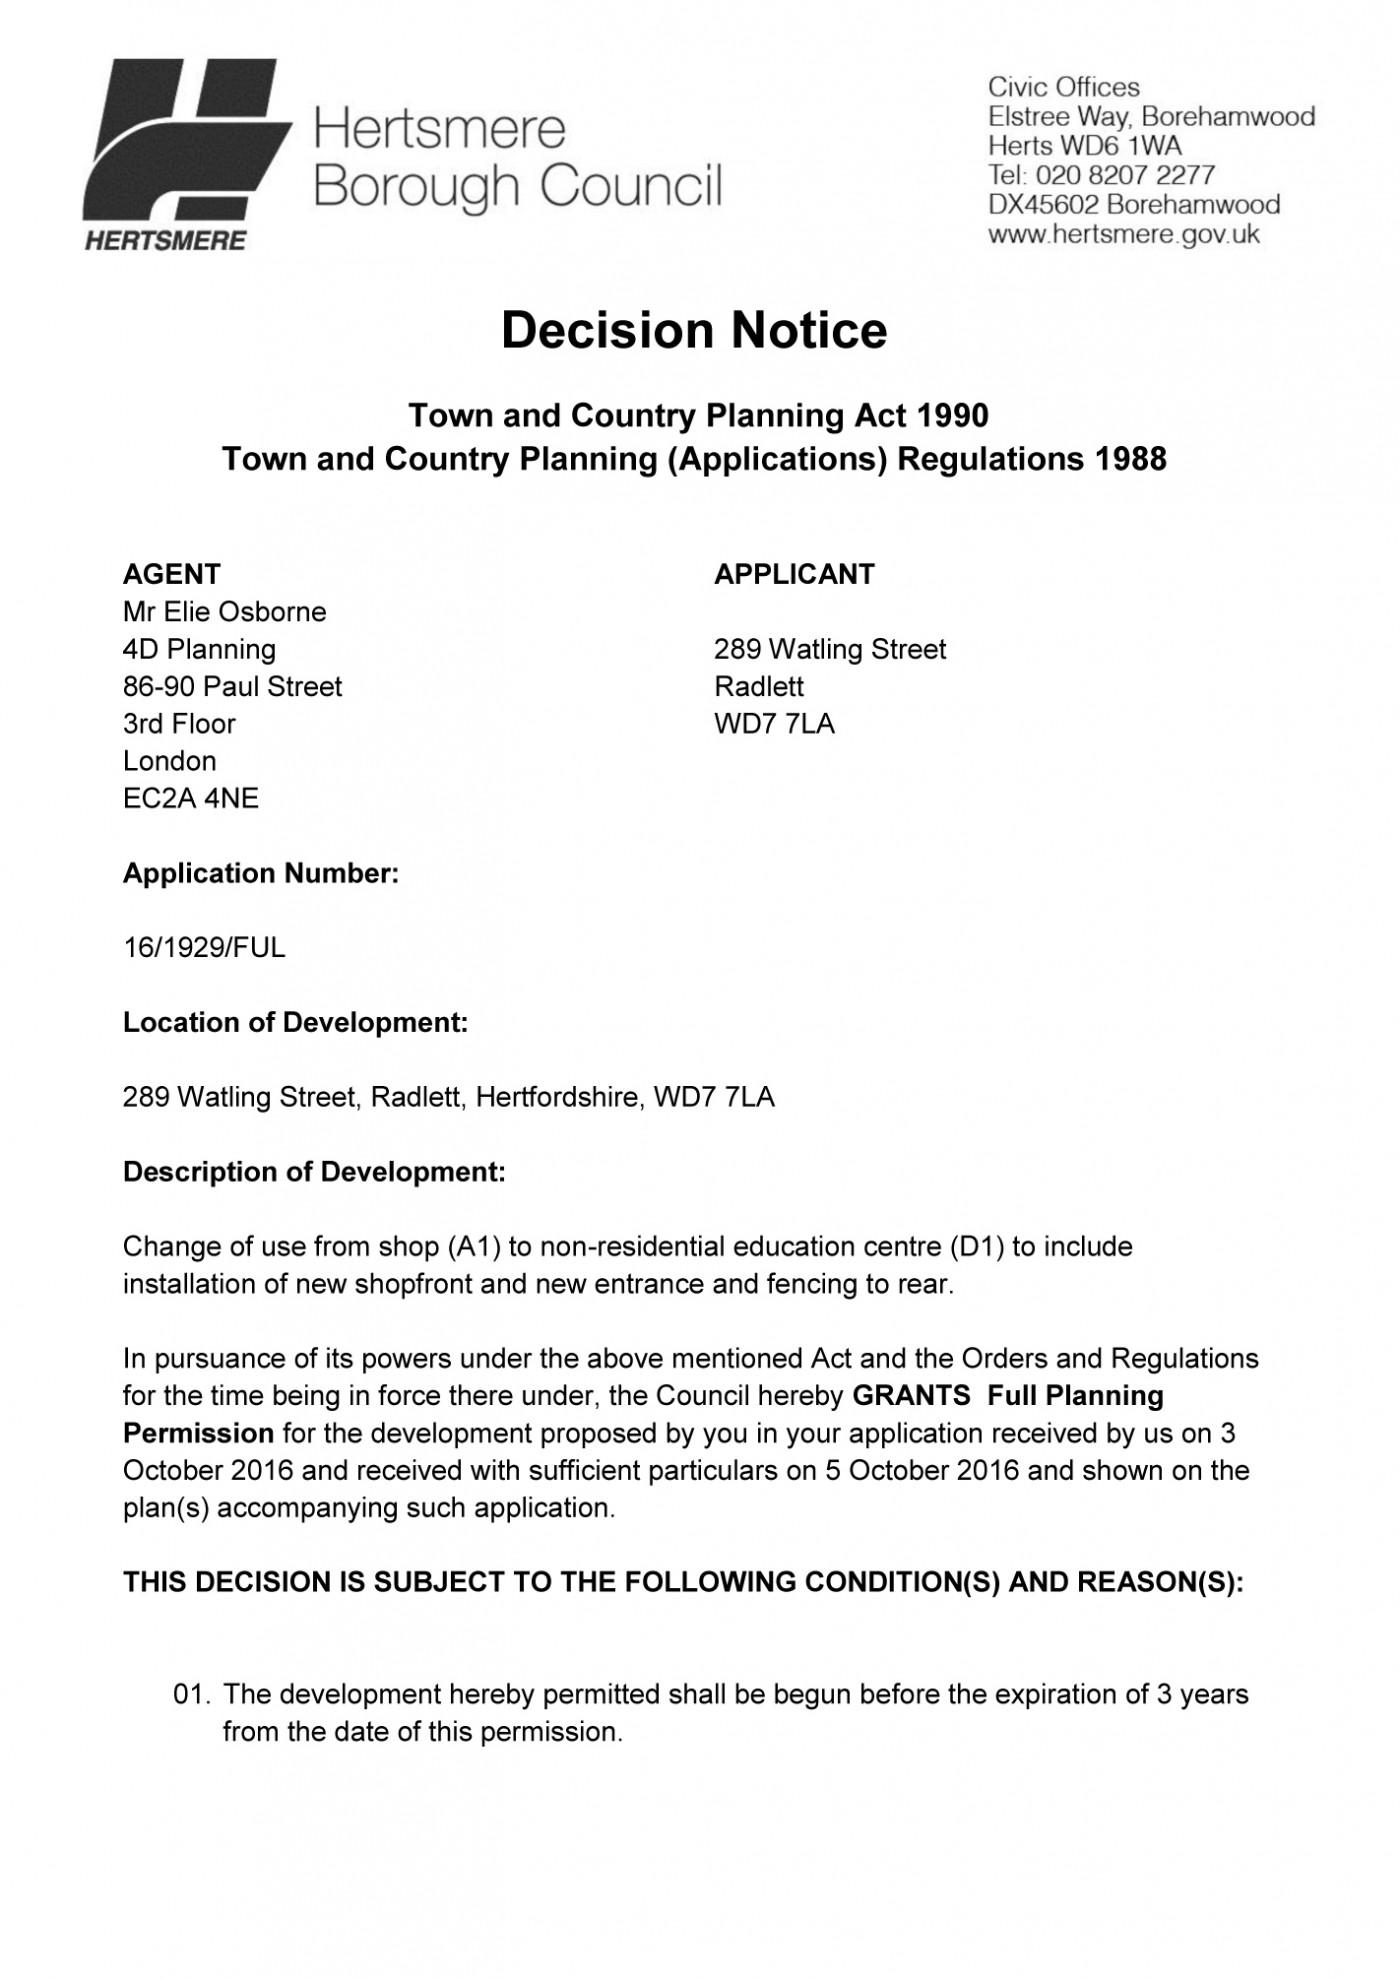 decision notice - Hertsmere